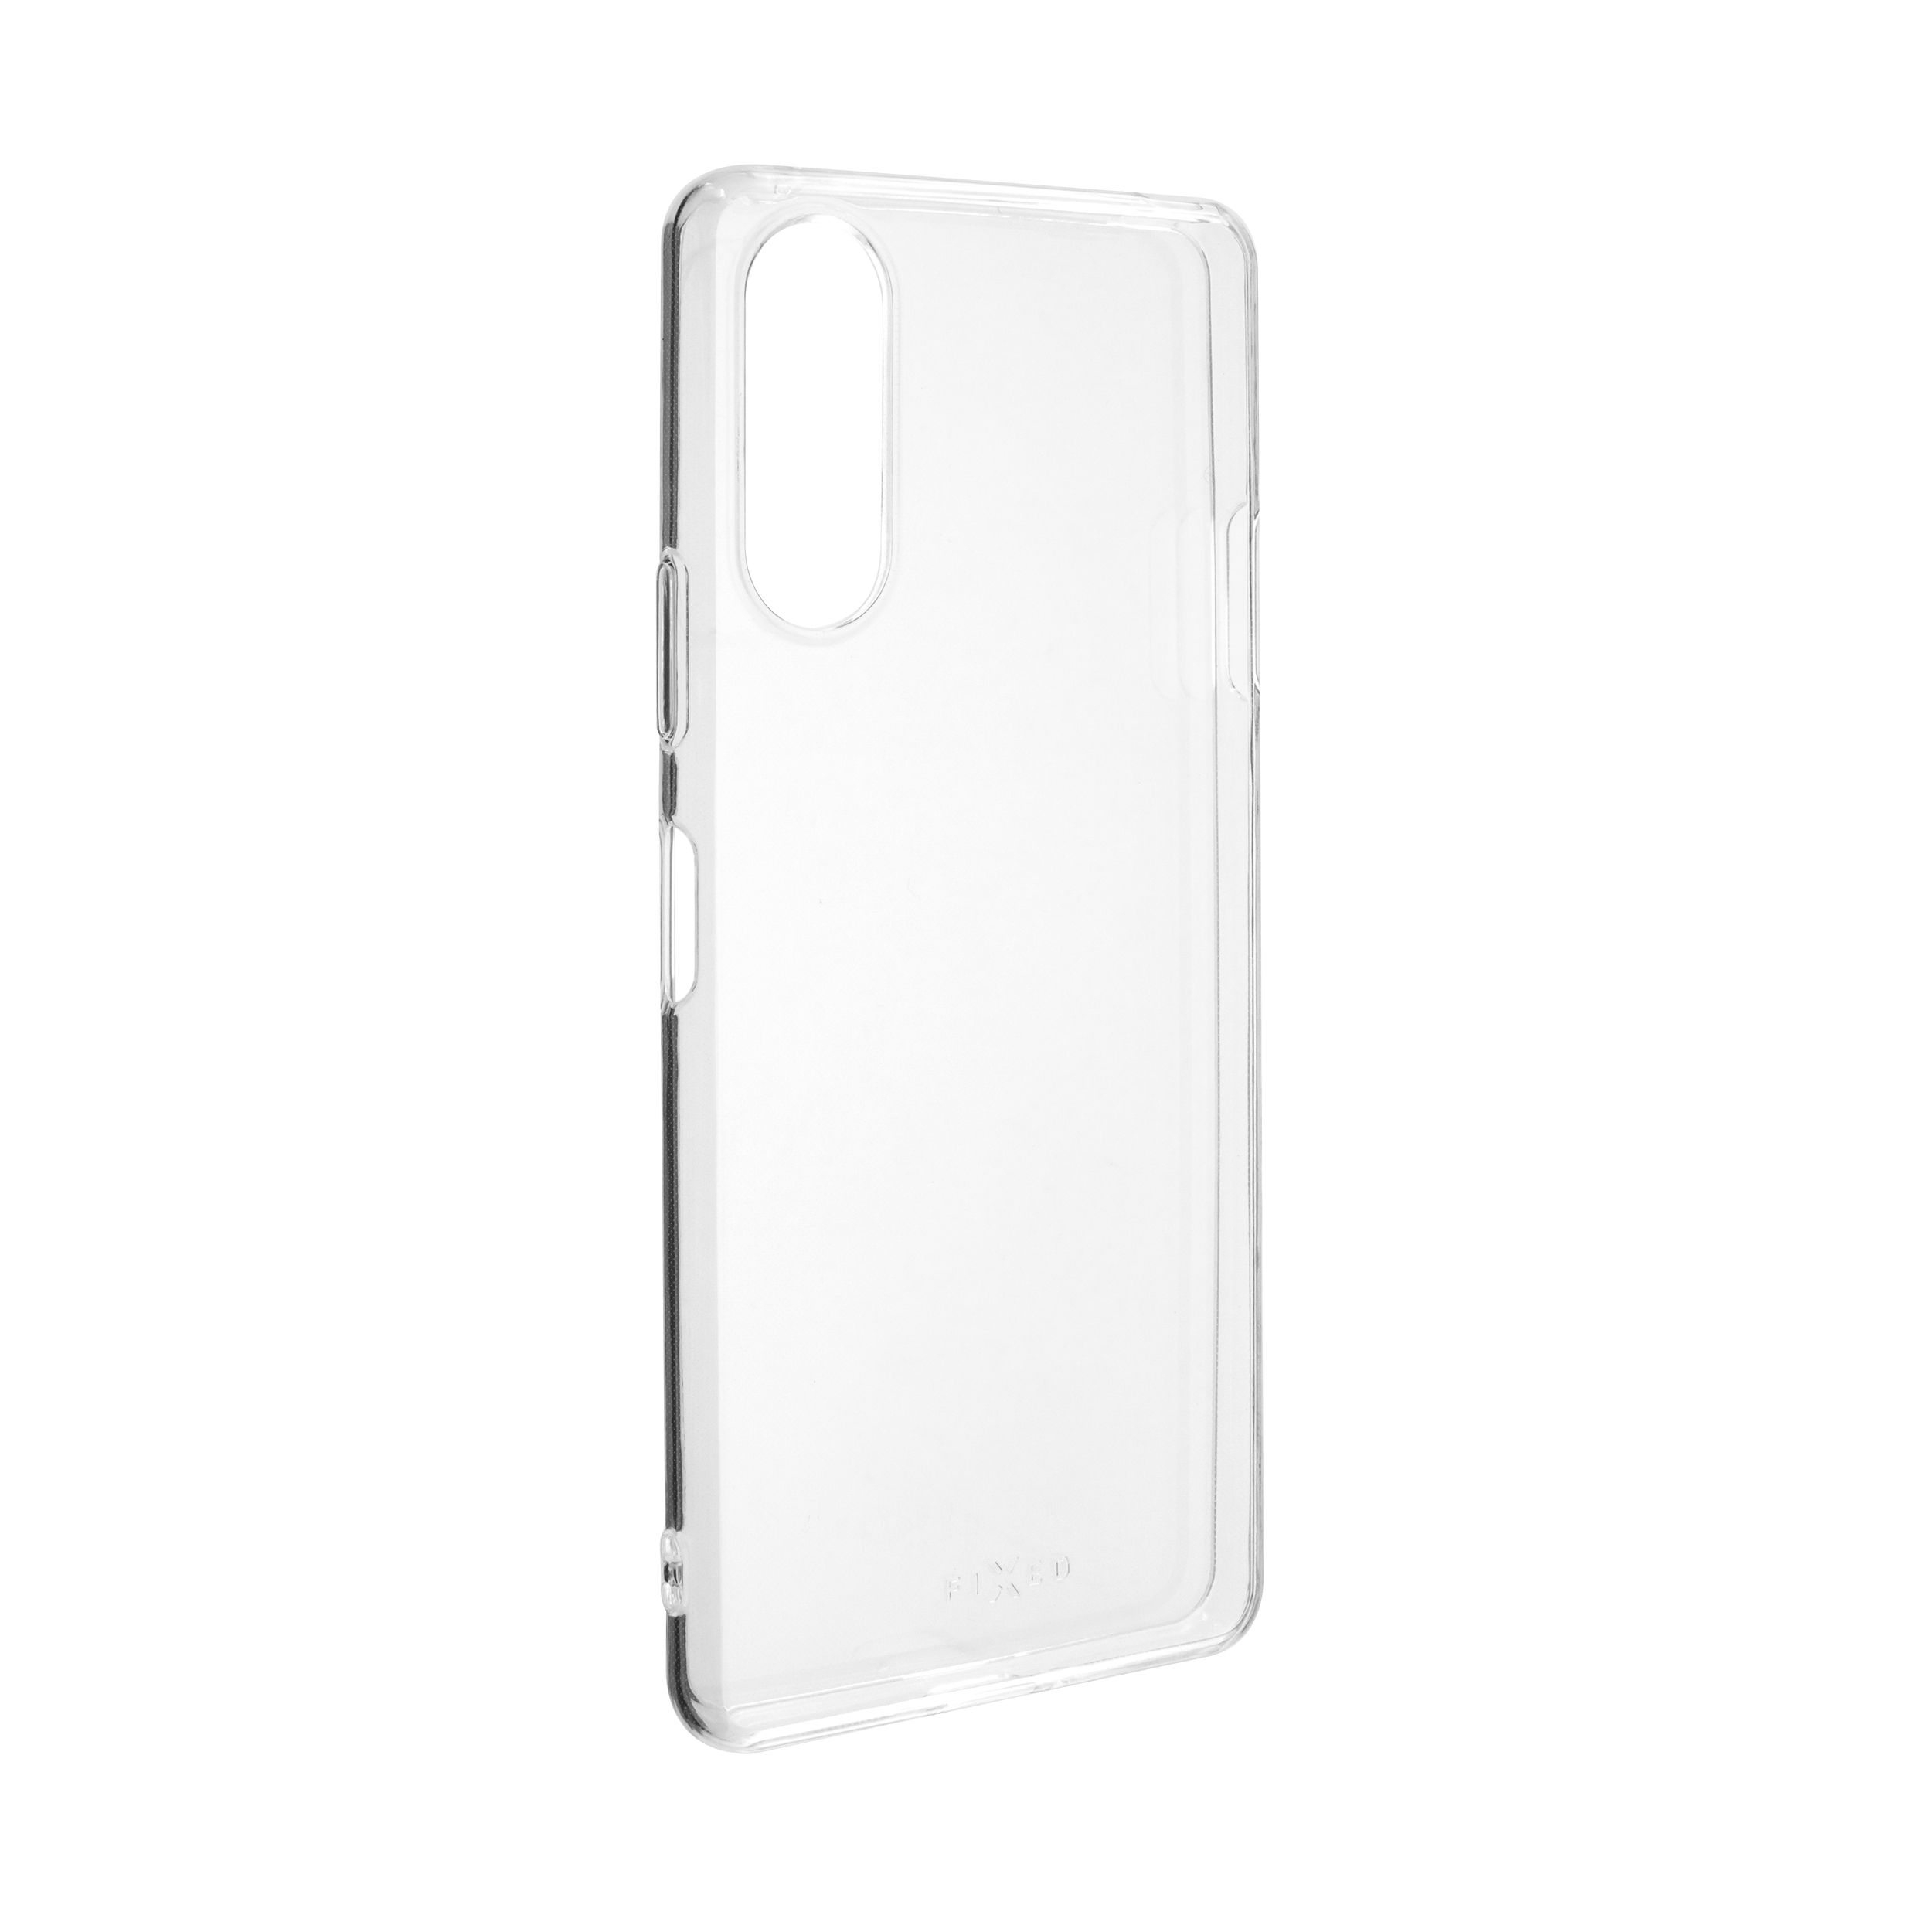 TPU gelové pouzdro FIXED pro Sony Xperia 10 II, čiré